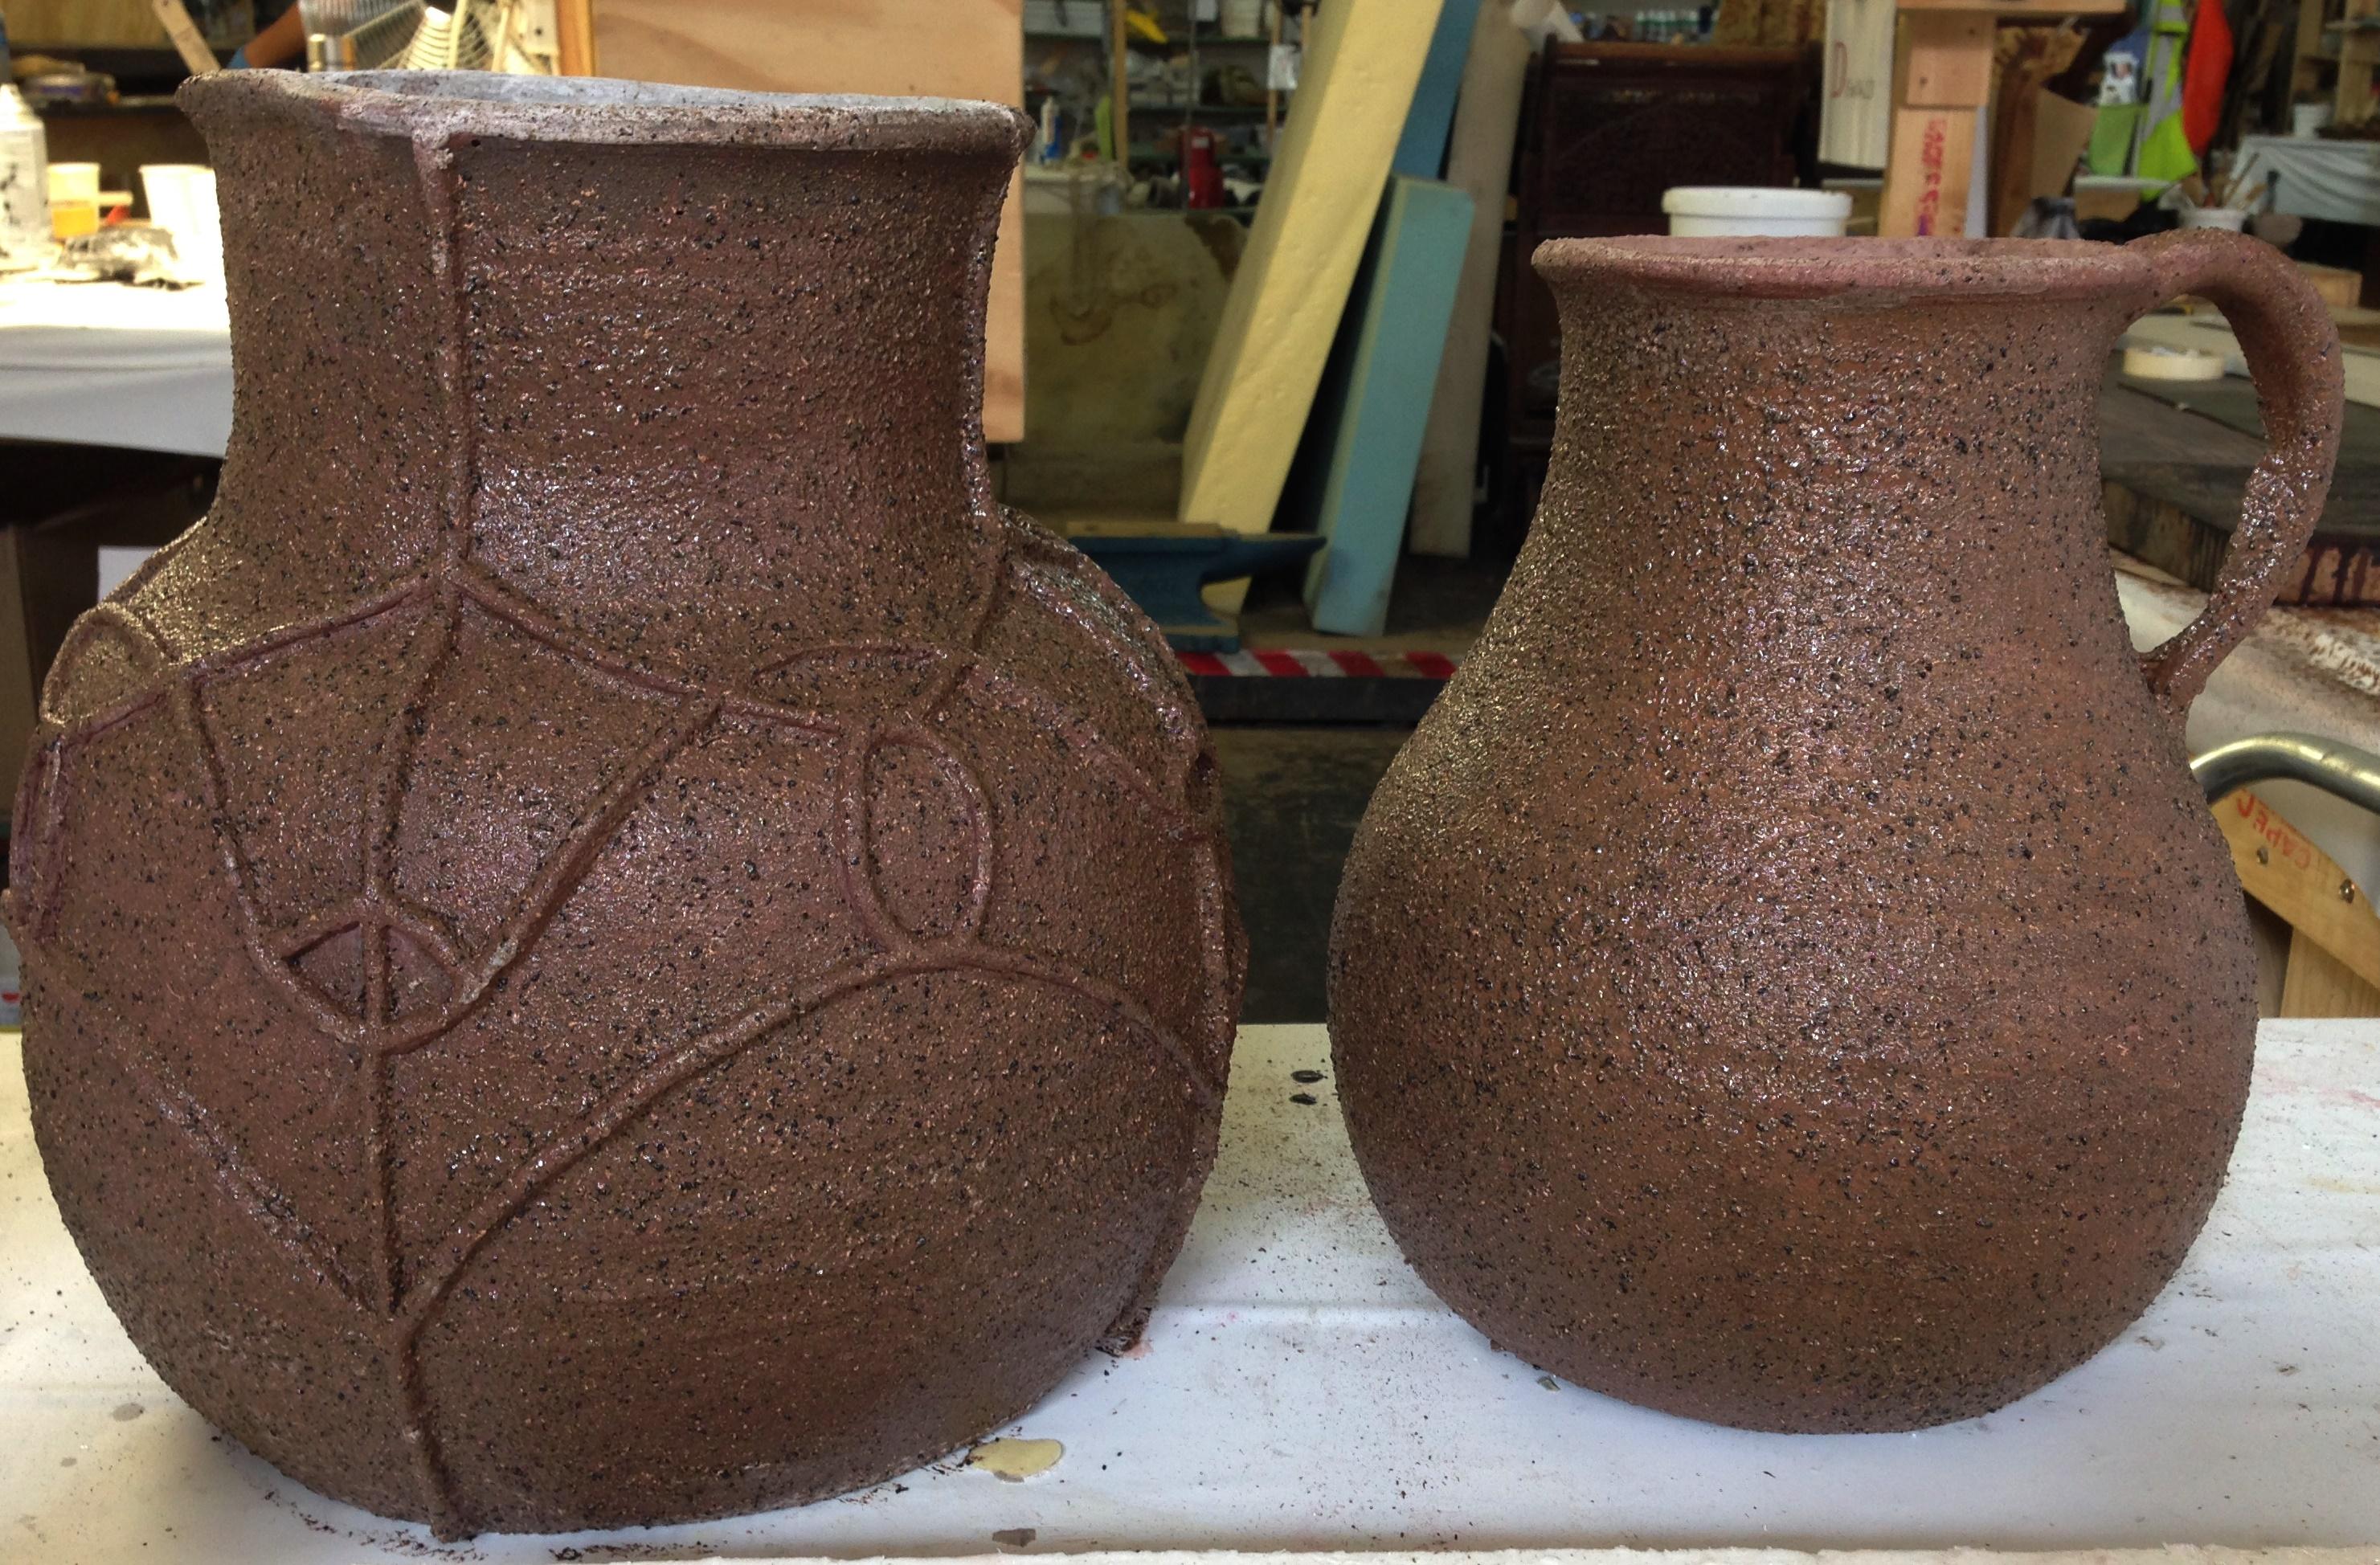 Fabricated pots